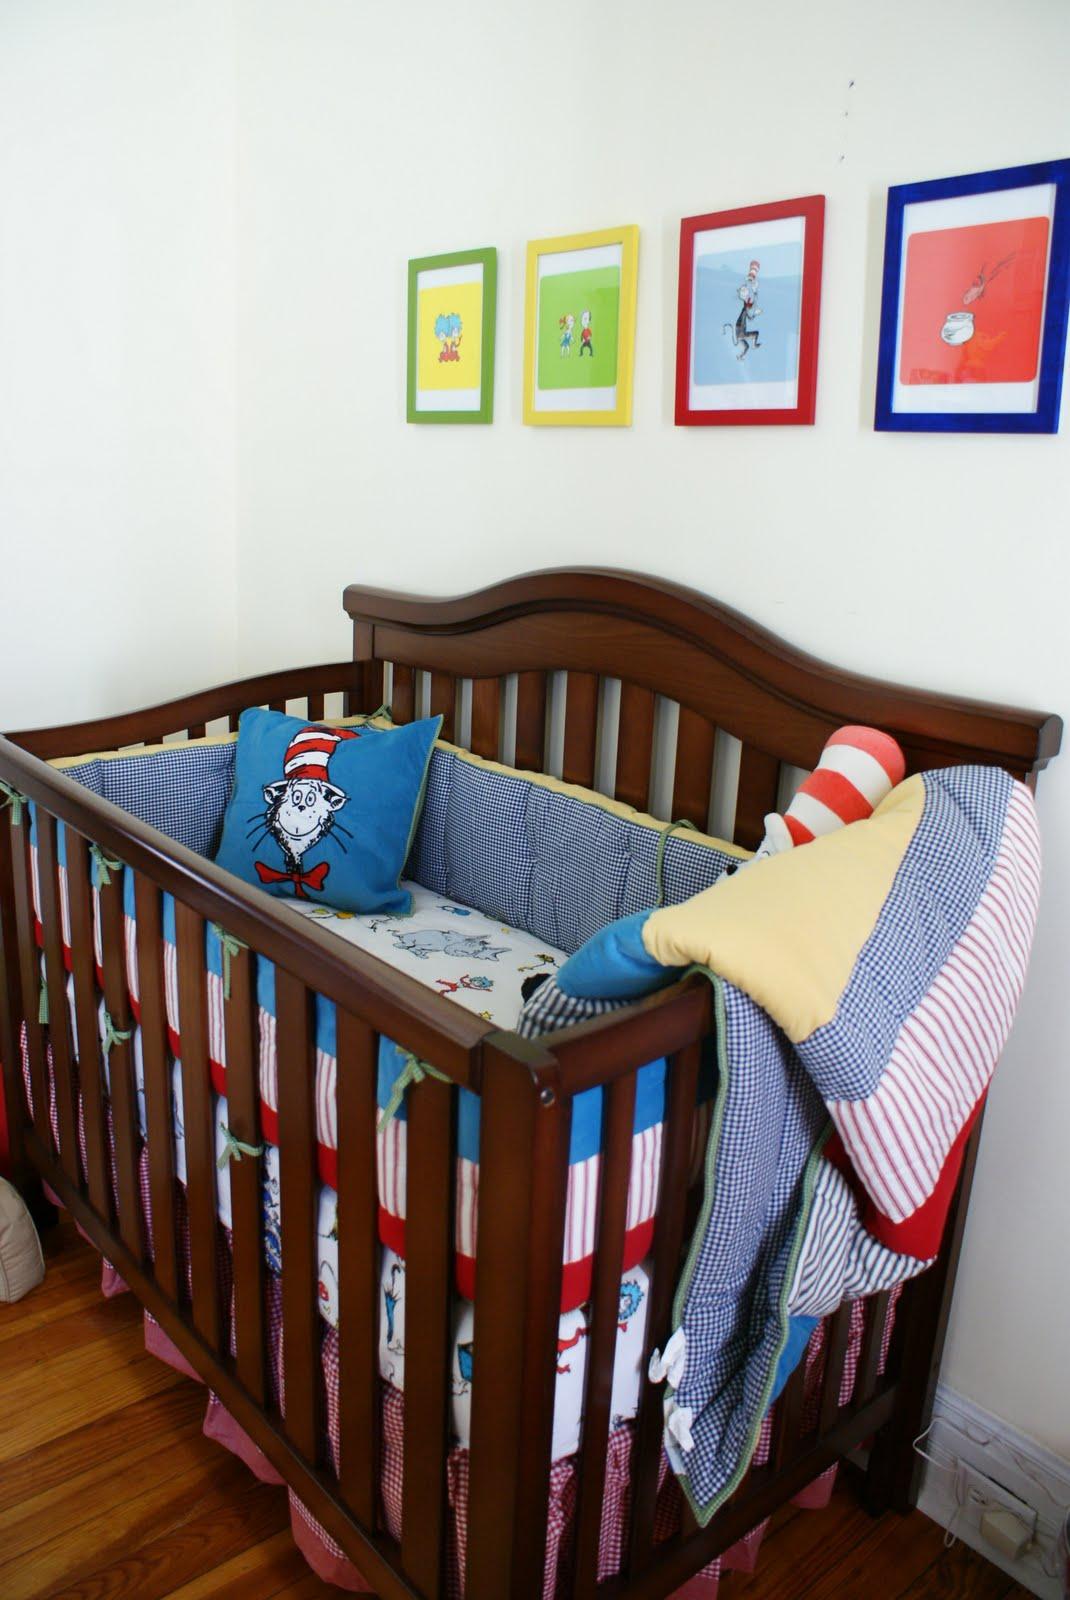 Dr Seuss Themed Kids Room Ideas